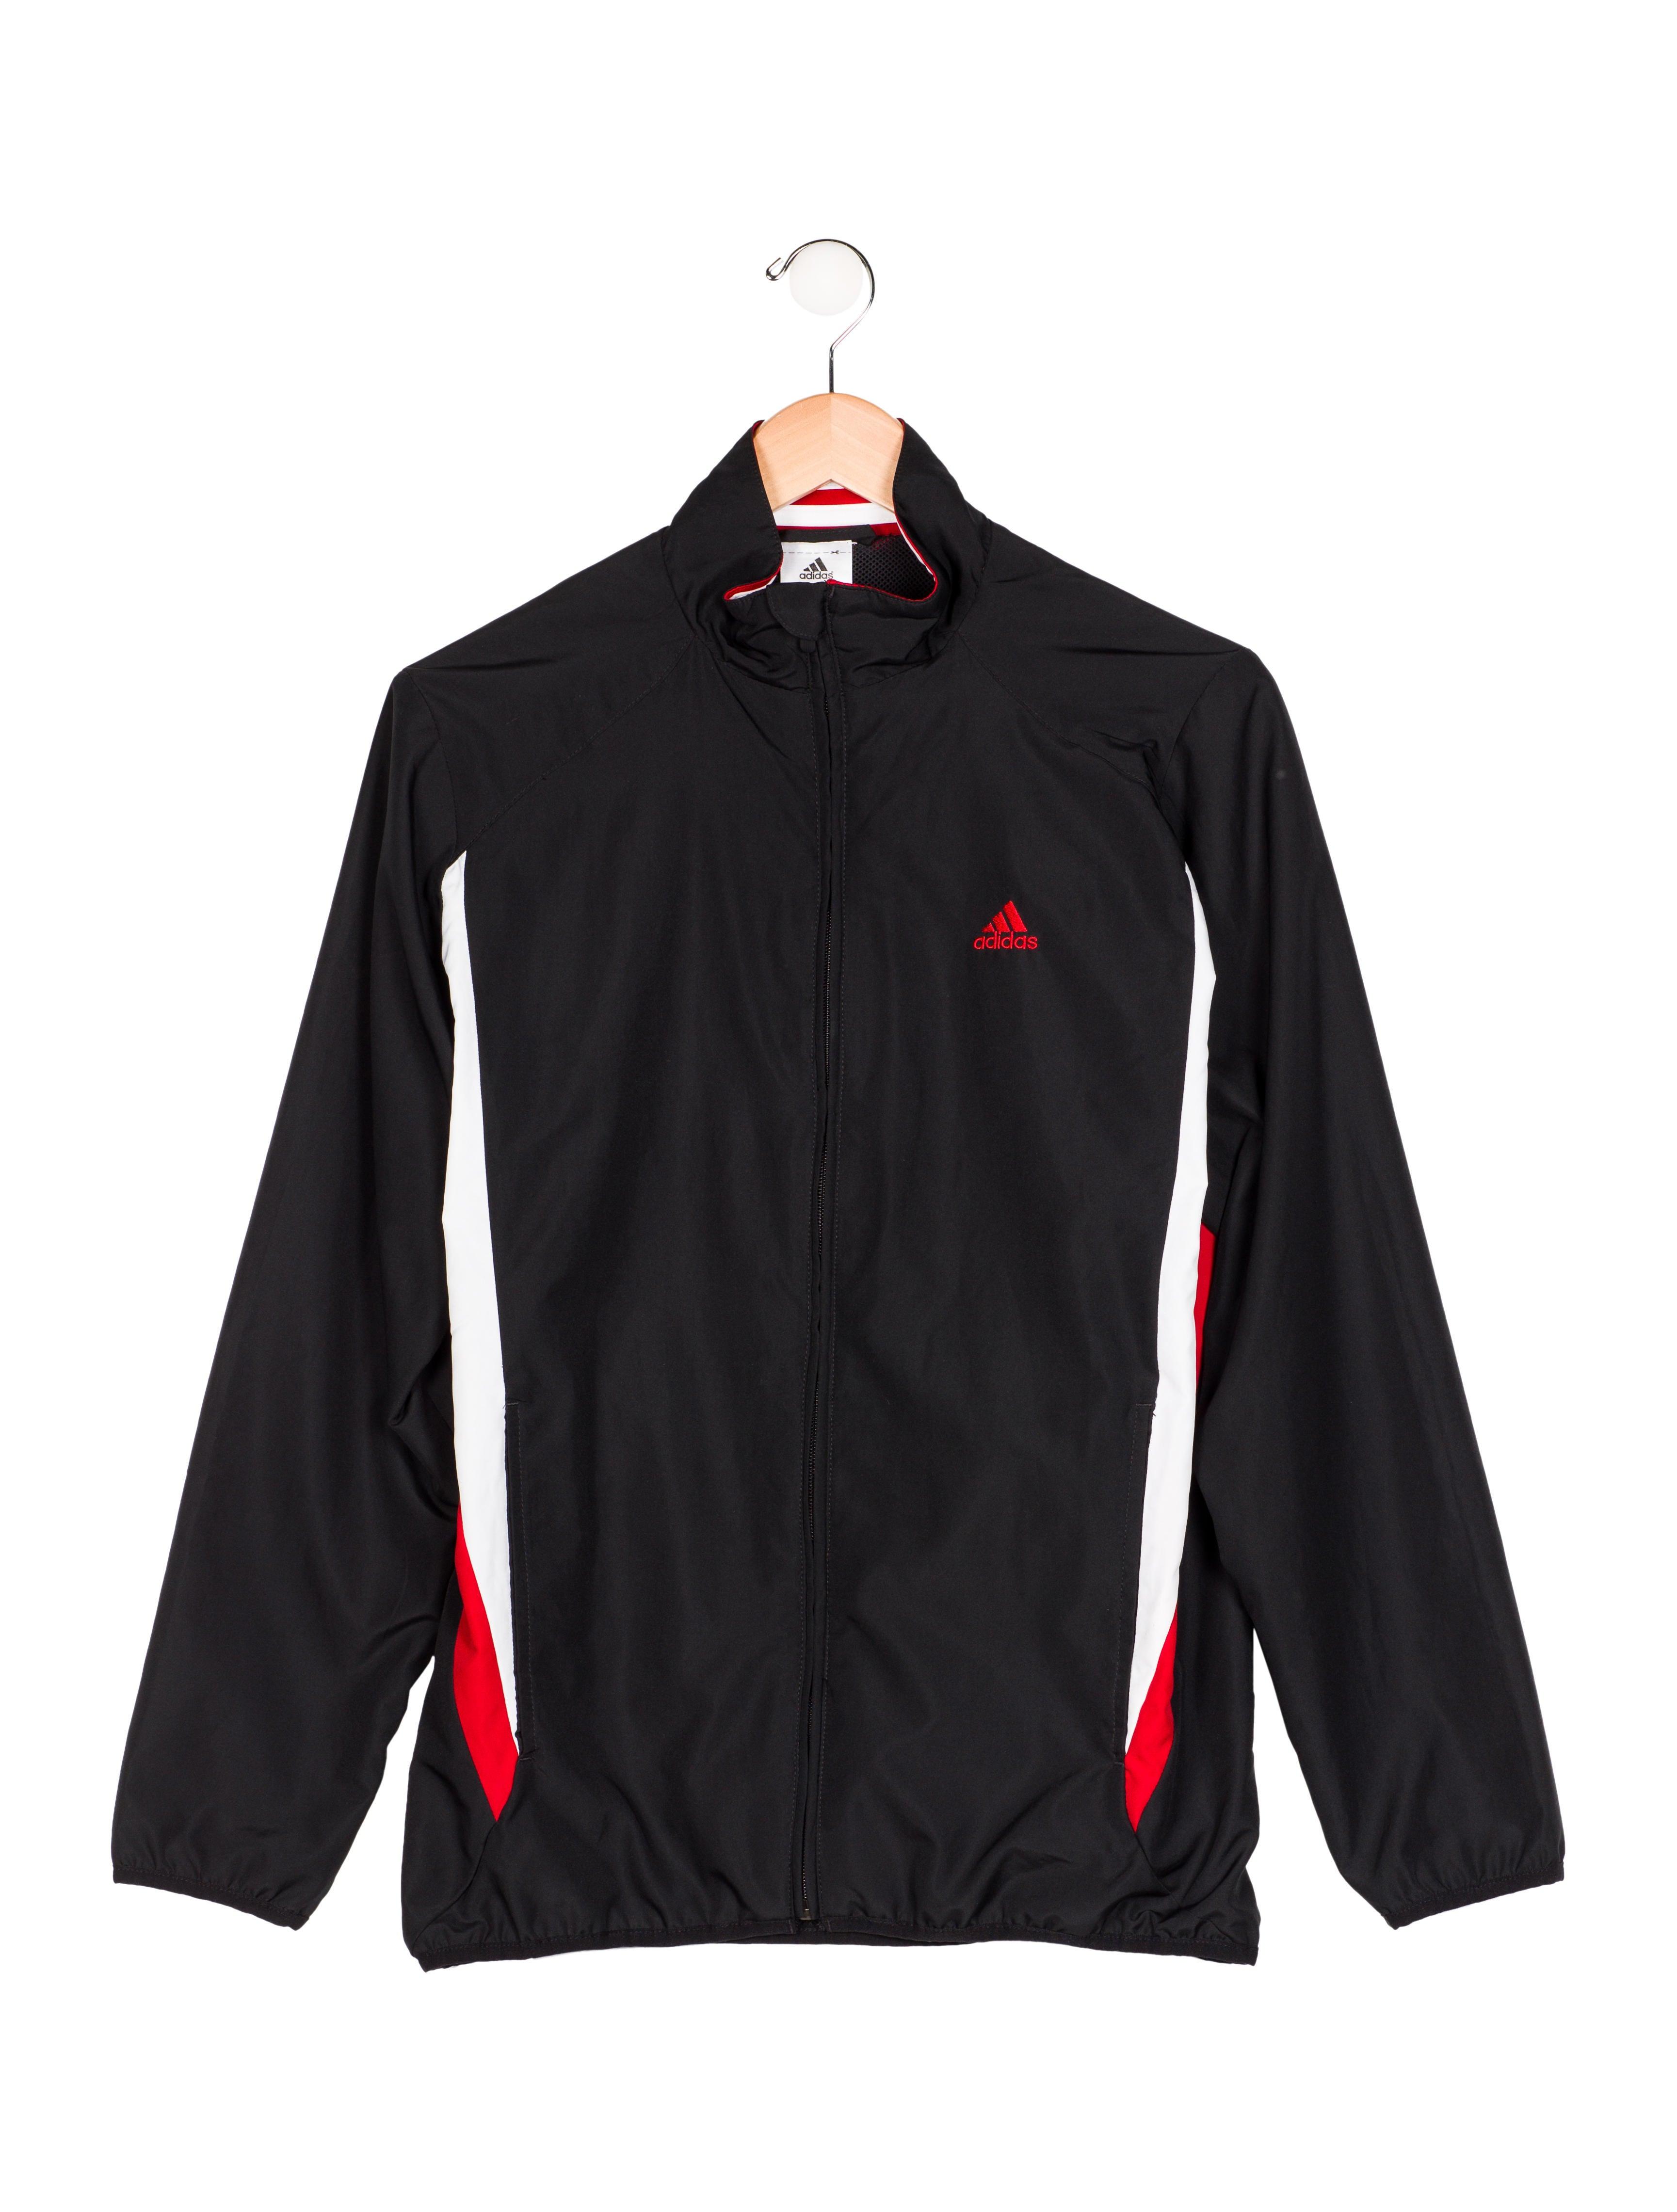 Adidas Boysu0026#39; Colorblock Zip-Up Jacket - Boys - W2ADS20475 | The RealReal